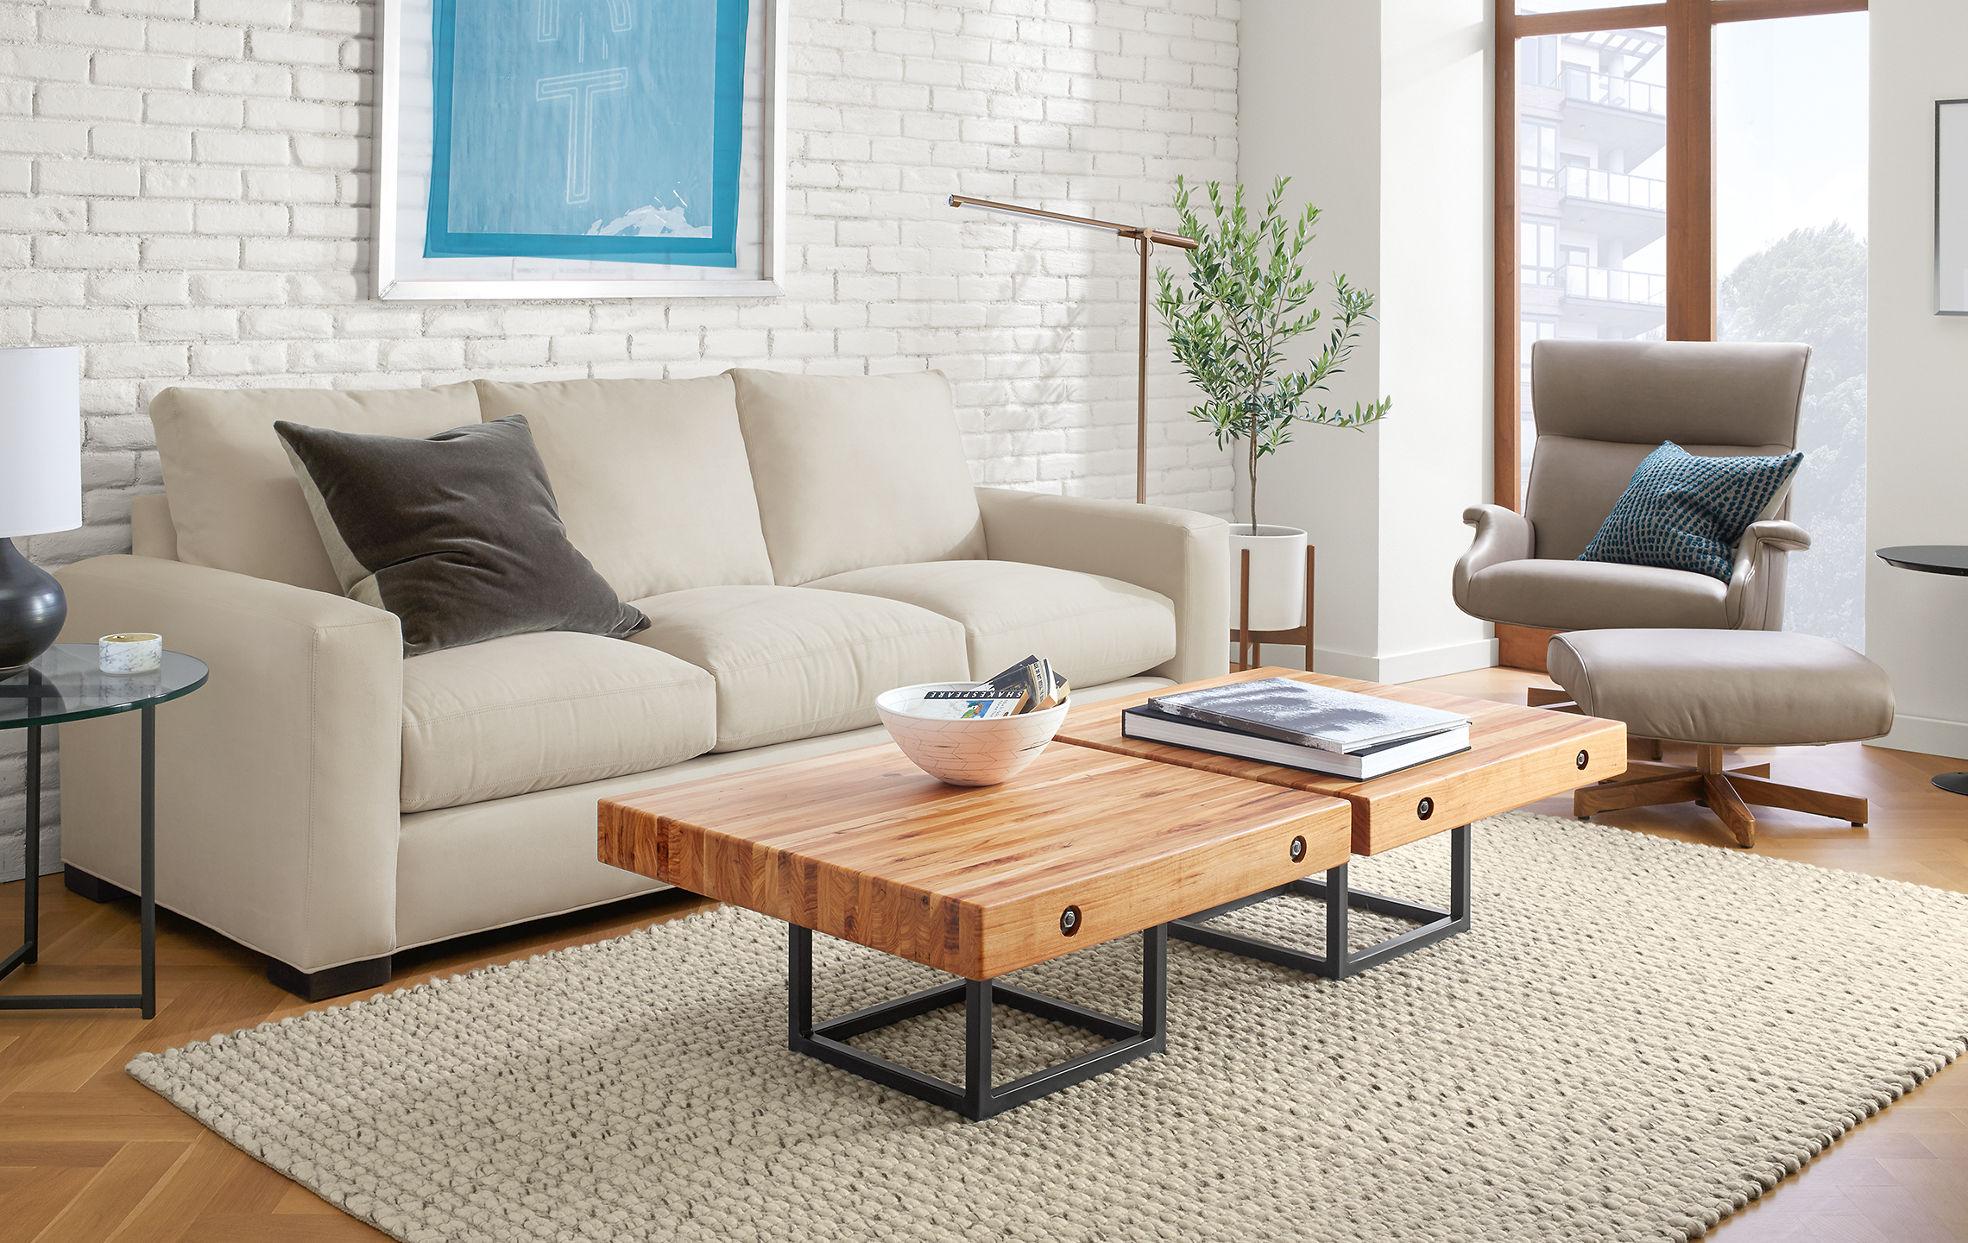 modern rugs rugs room board. Black Bedroom Furniture Sets. Home Design Ideas